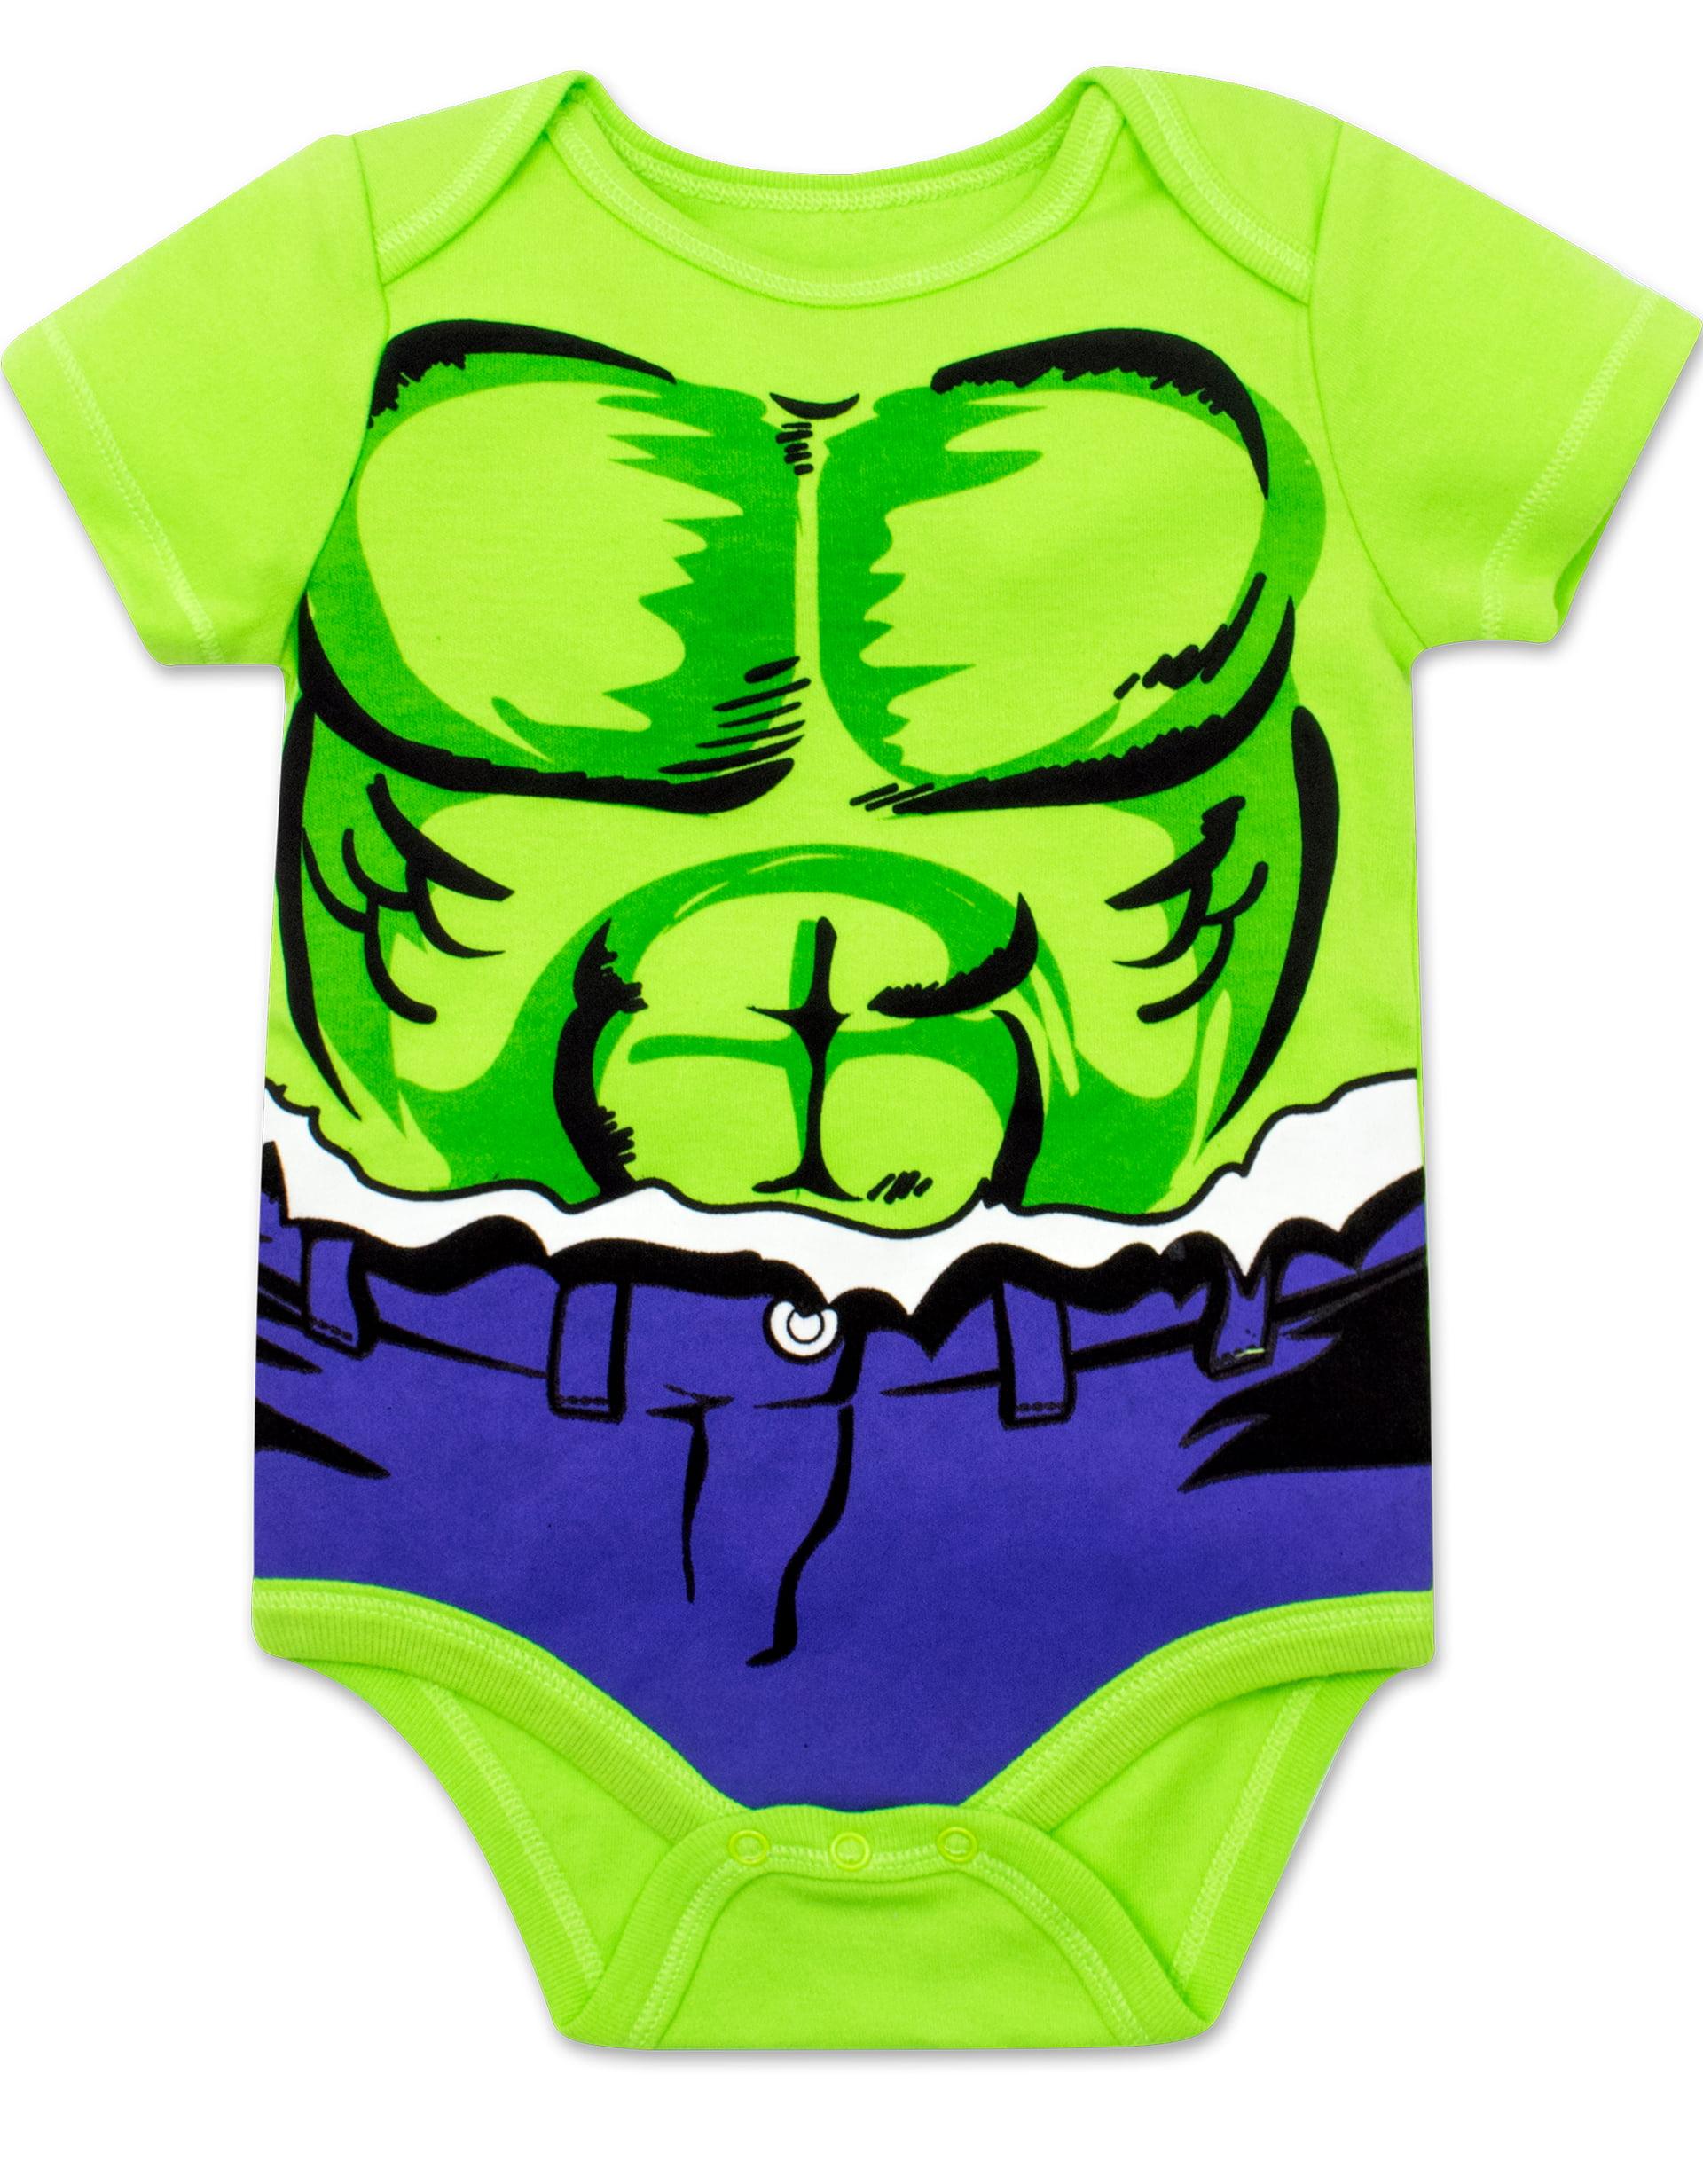 Spiderman Marvel 5-Pack Avengers Baby Boy Onesies with Iron Man Hulk Captain America Thor